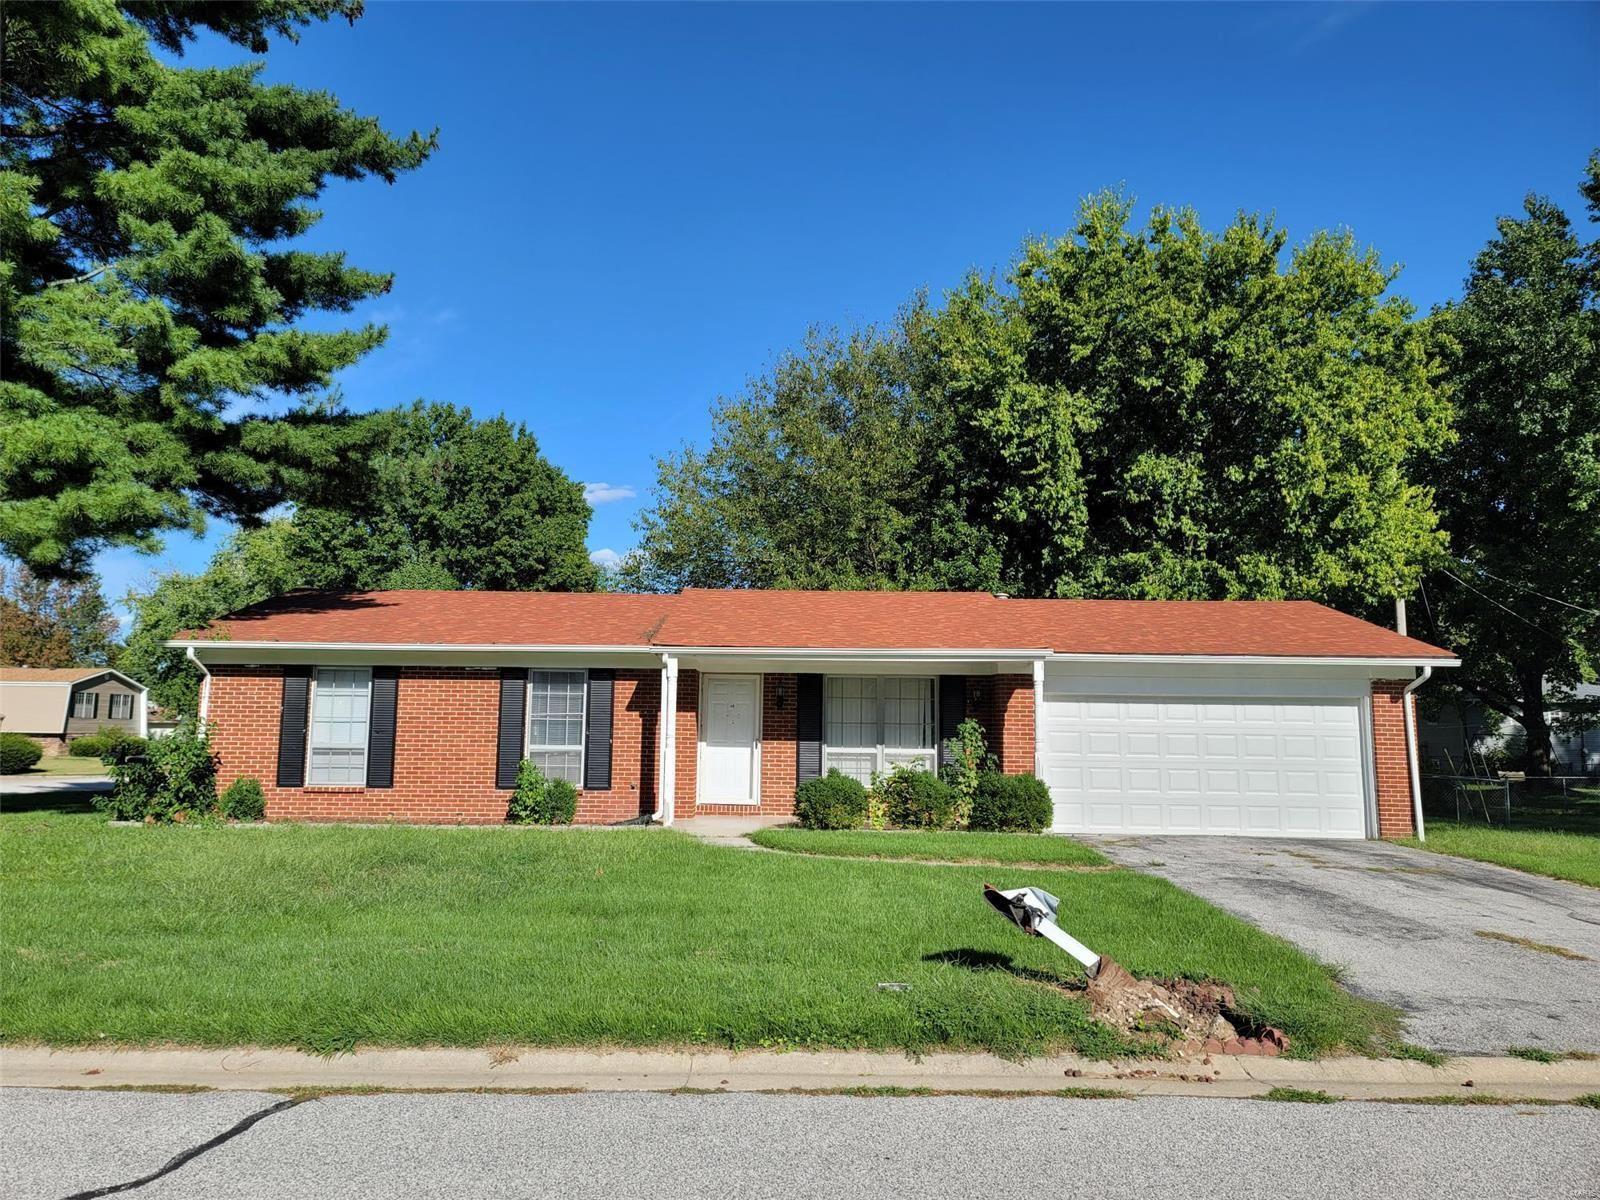 420 Anita Drive, Fairview Heights, IL 62208 - MLS#: 21066073